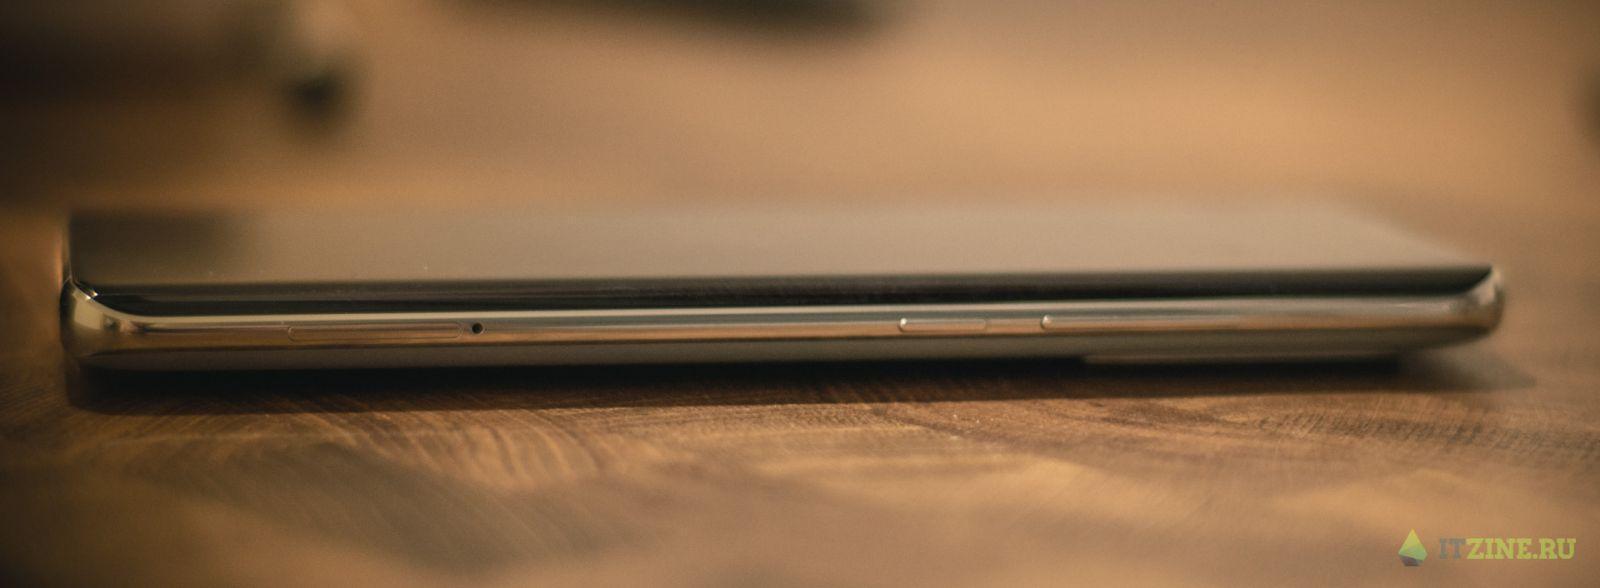 Обзор Xiaomi Mi Note 10 Pro. Добротный флагман (dsc 8076)